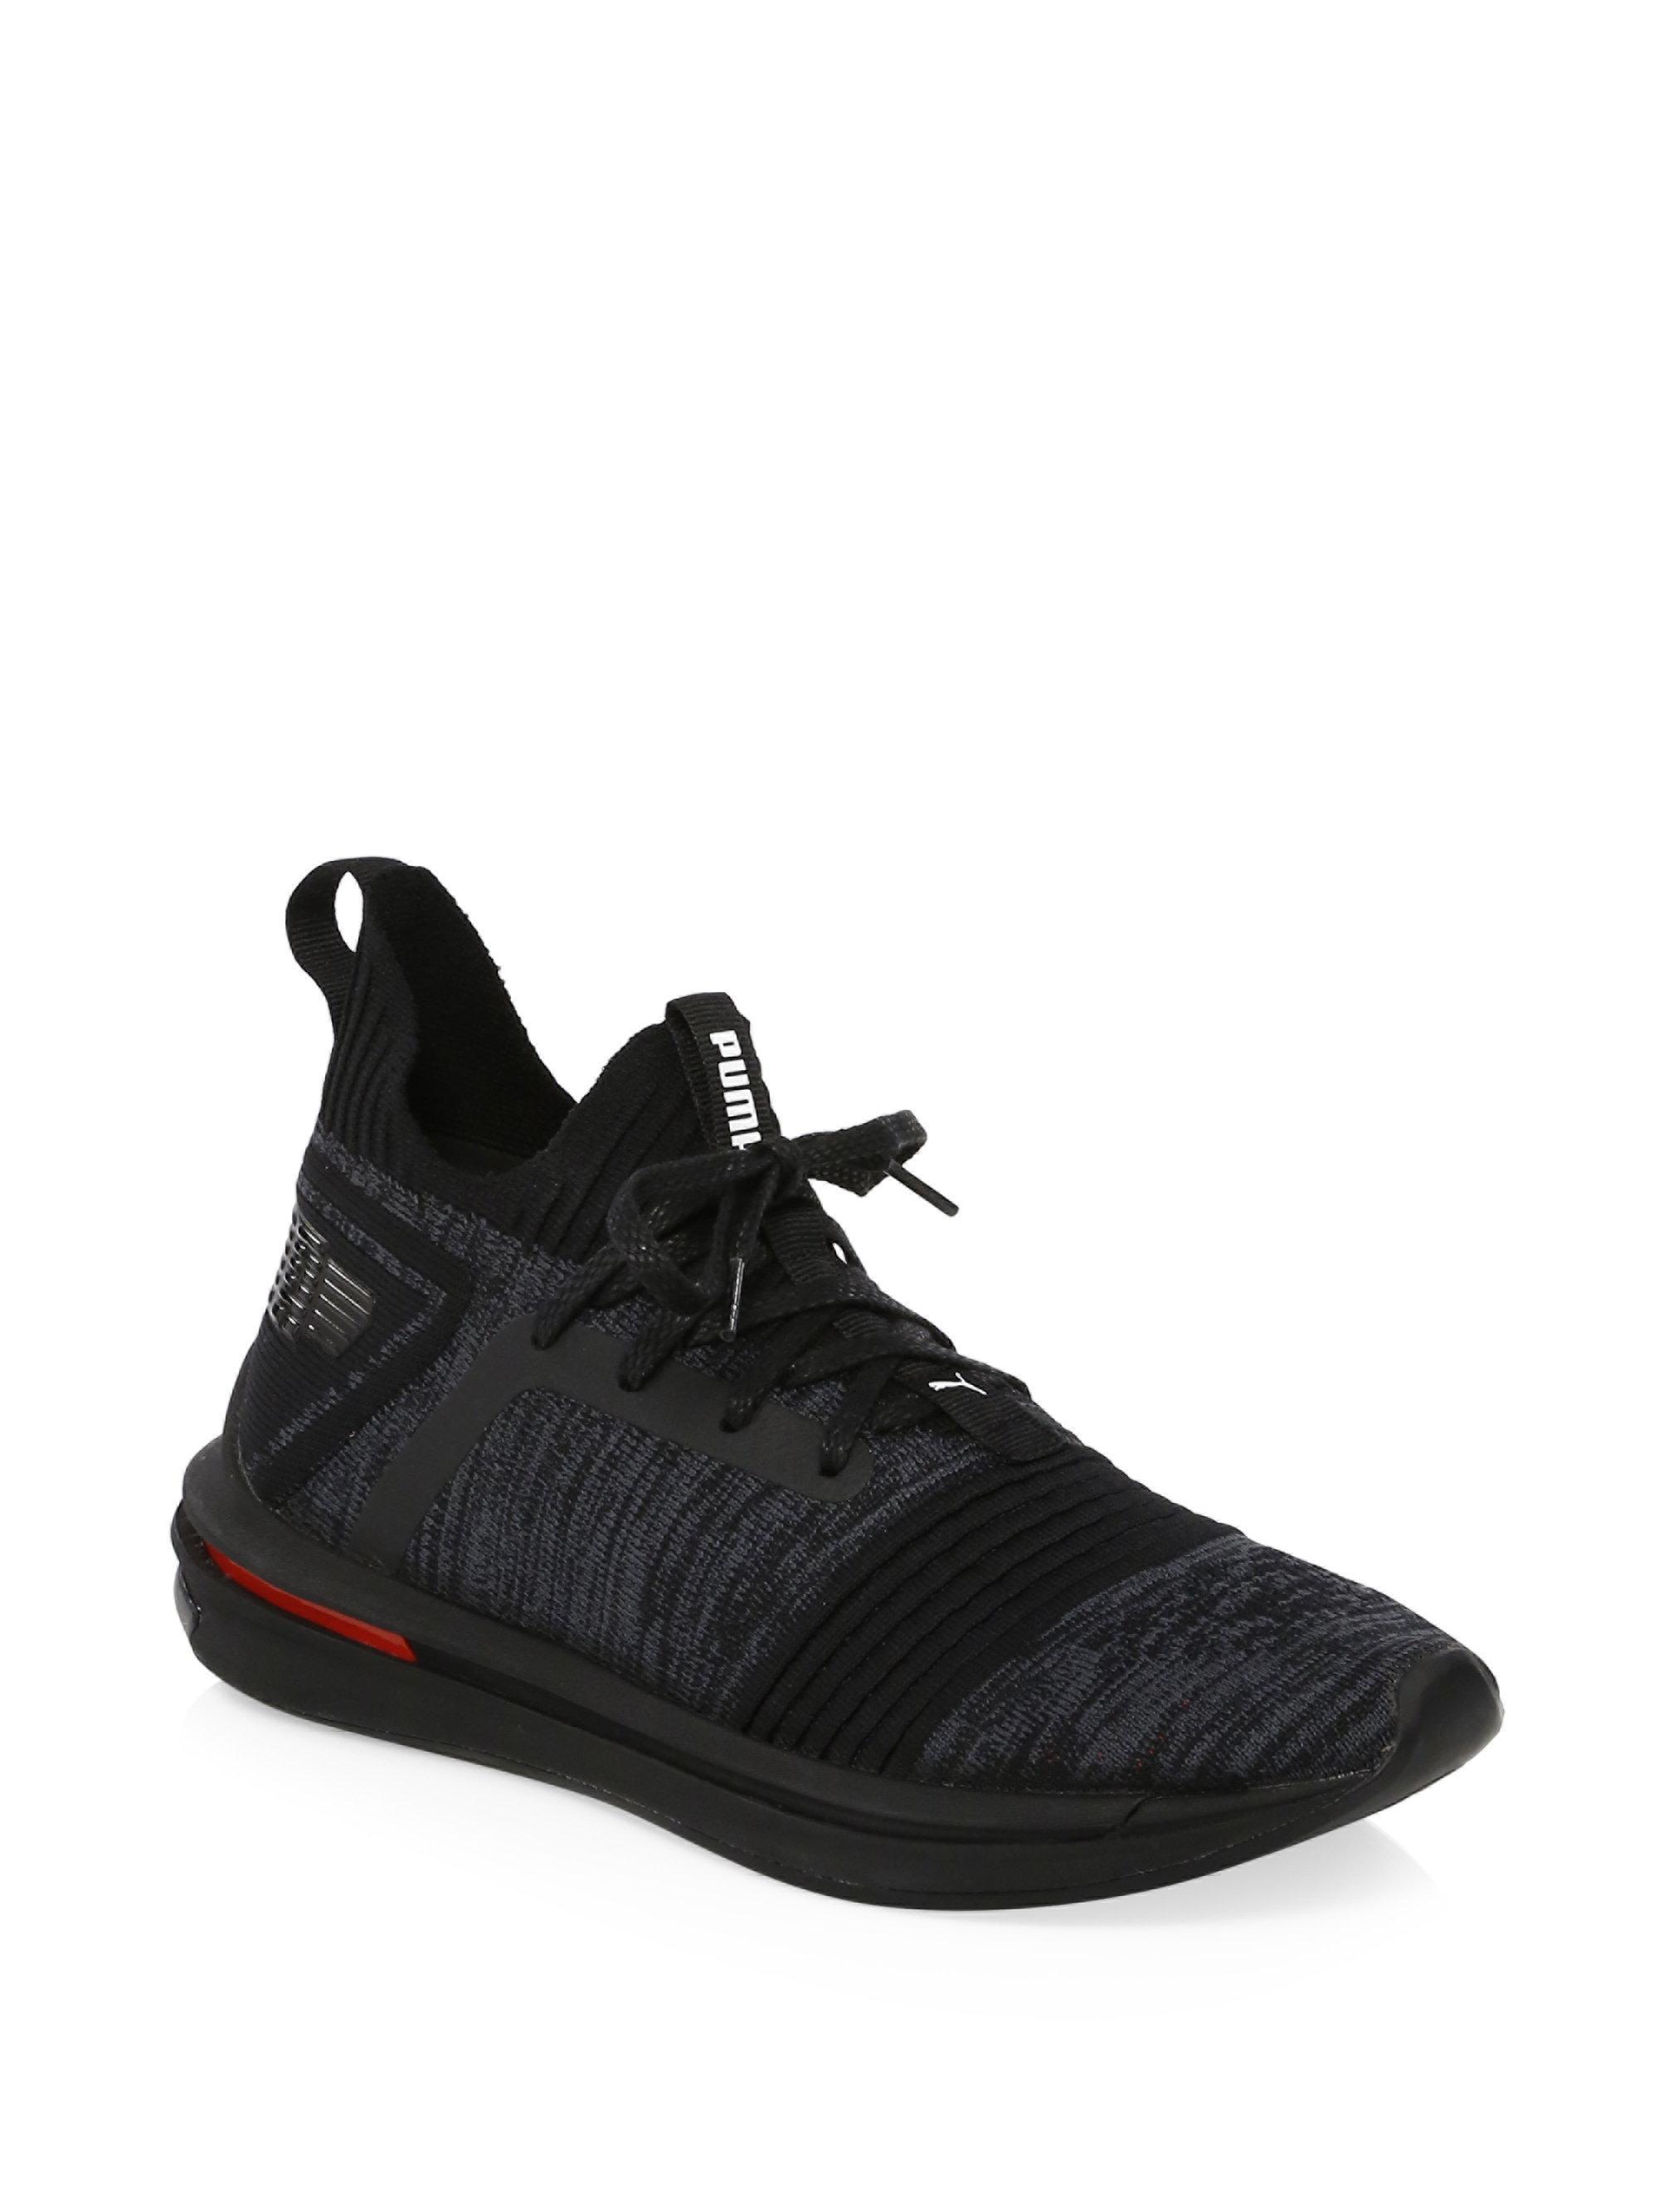 online store fe7db 29ede puma-black-Ignite-Limitless-Evoknit-Sneakers.jpeg